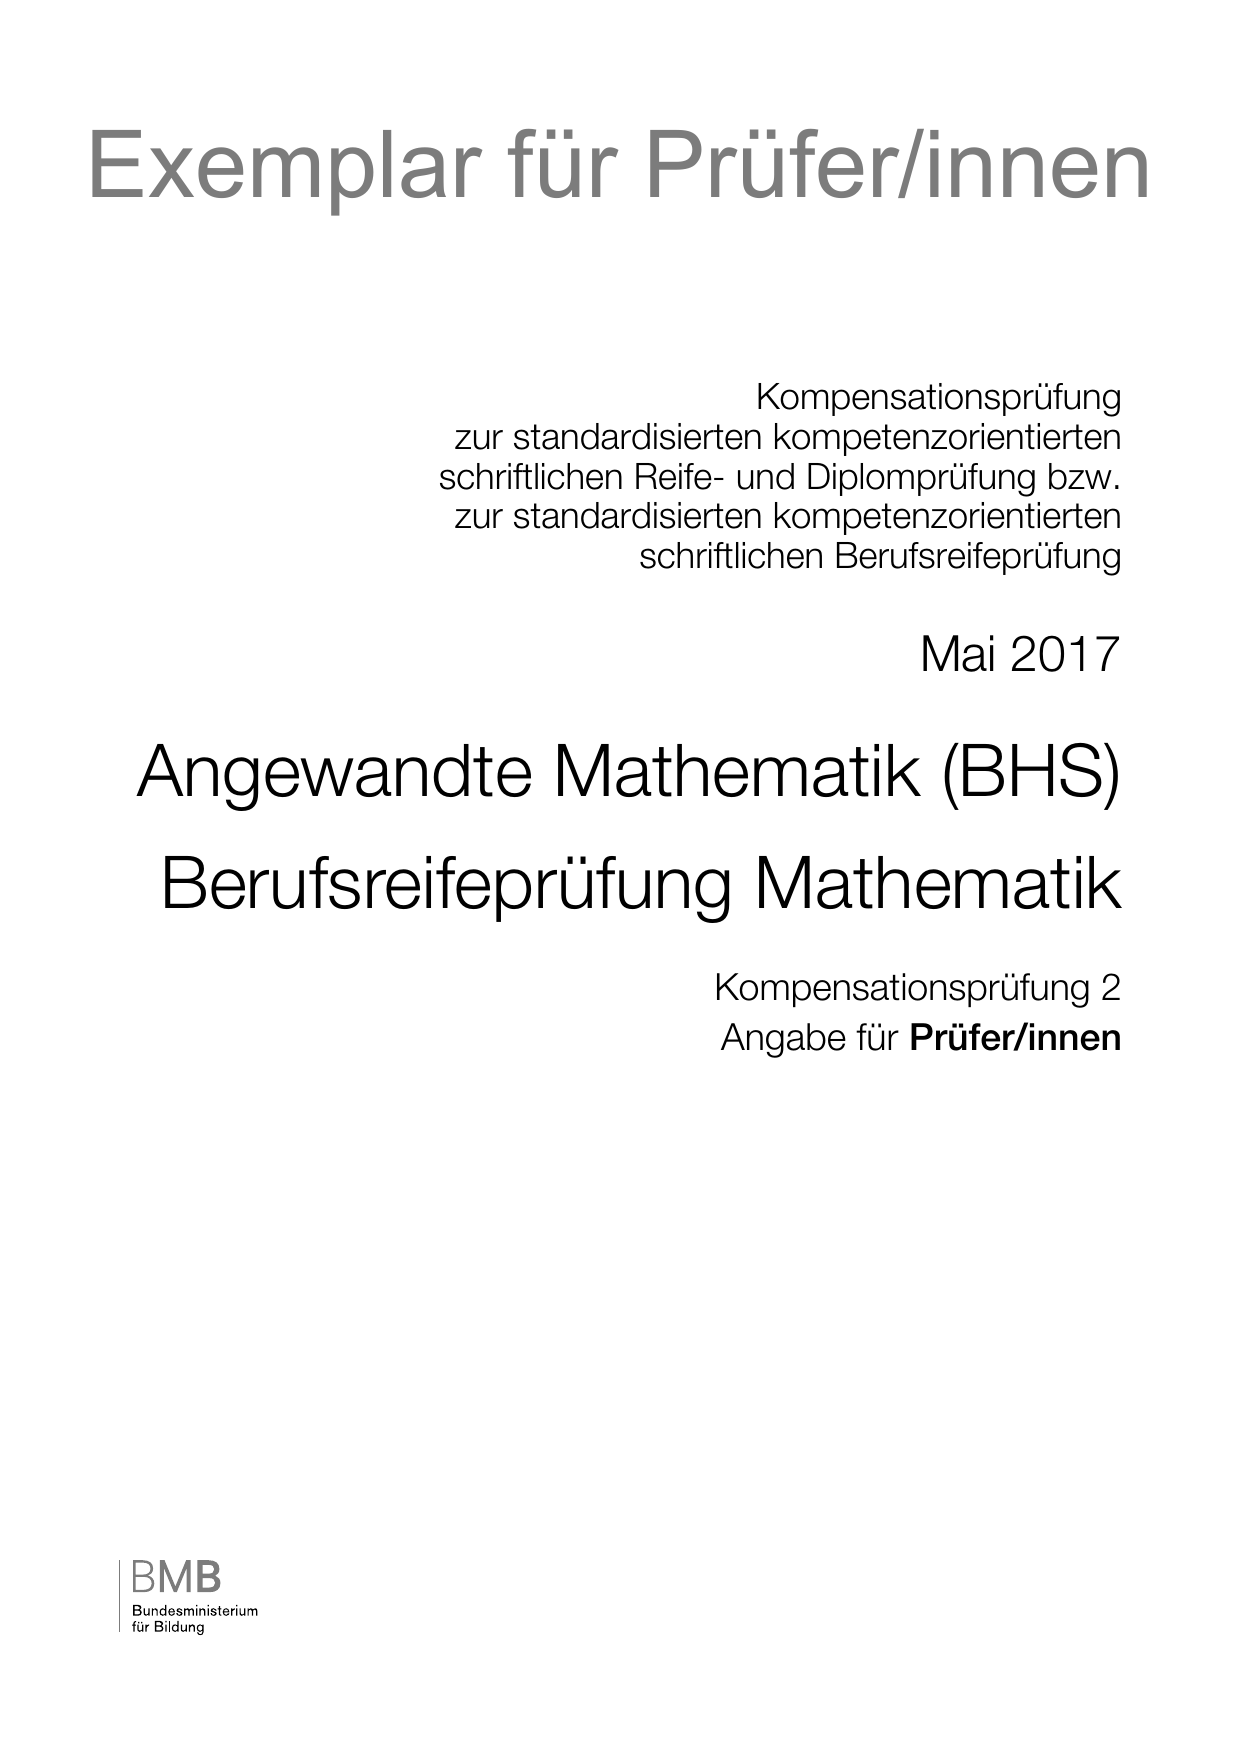 angewandte mathematik srdp